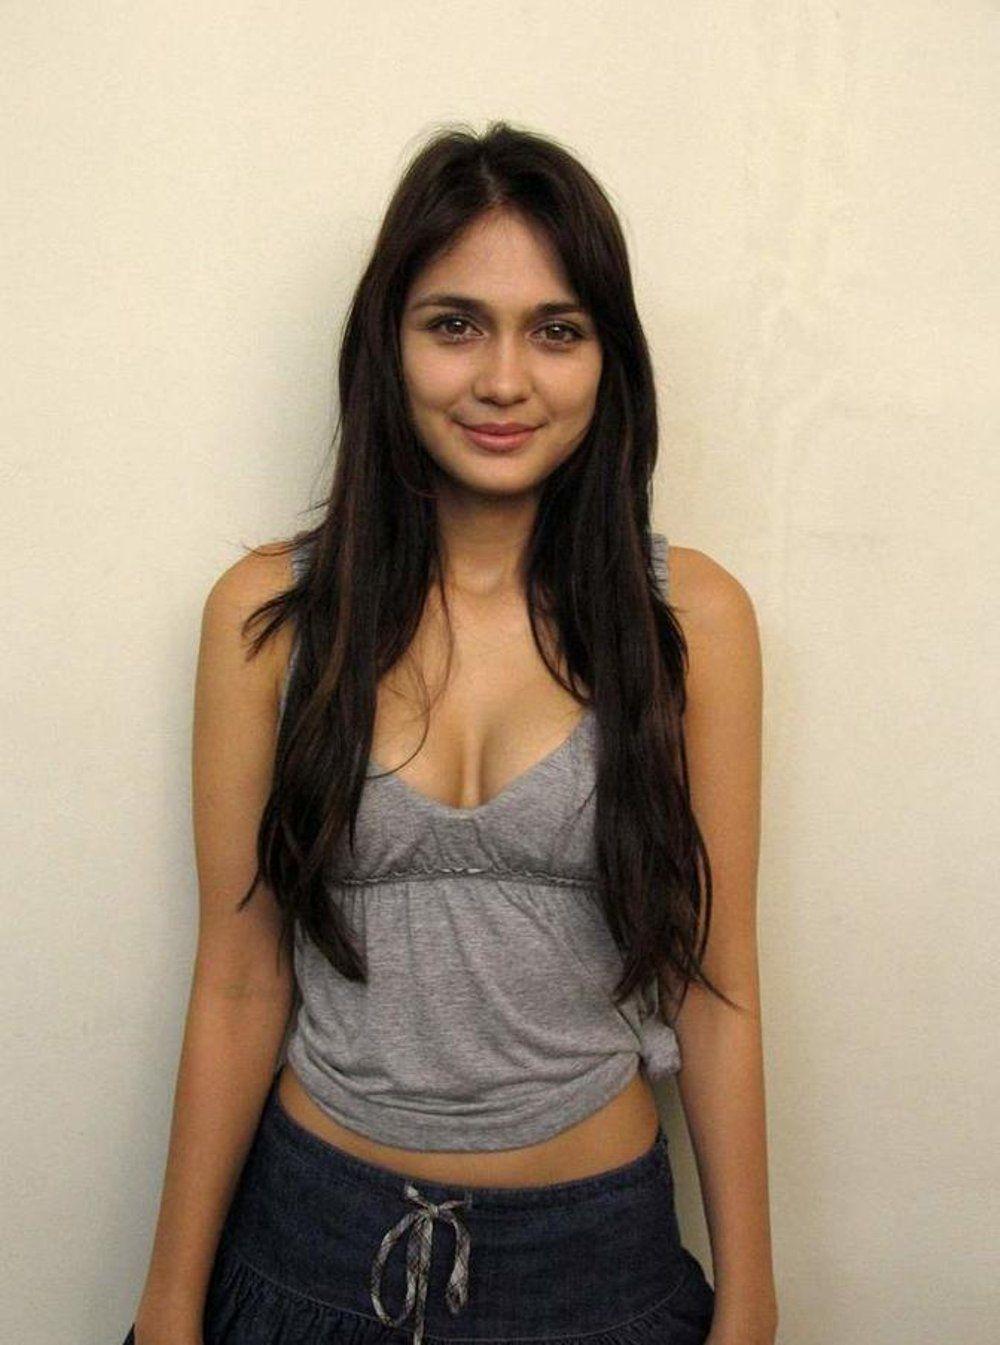 Luna Maya Setelah Putus Sama Reino Barack Wanita Cantik Wanita Artis